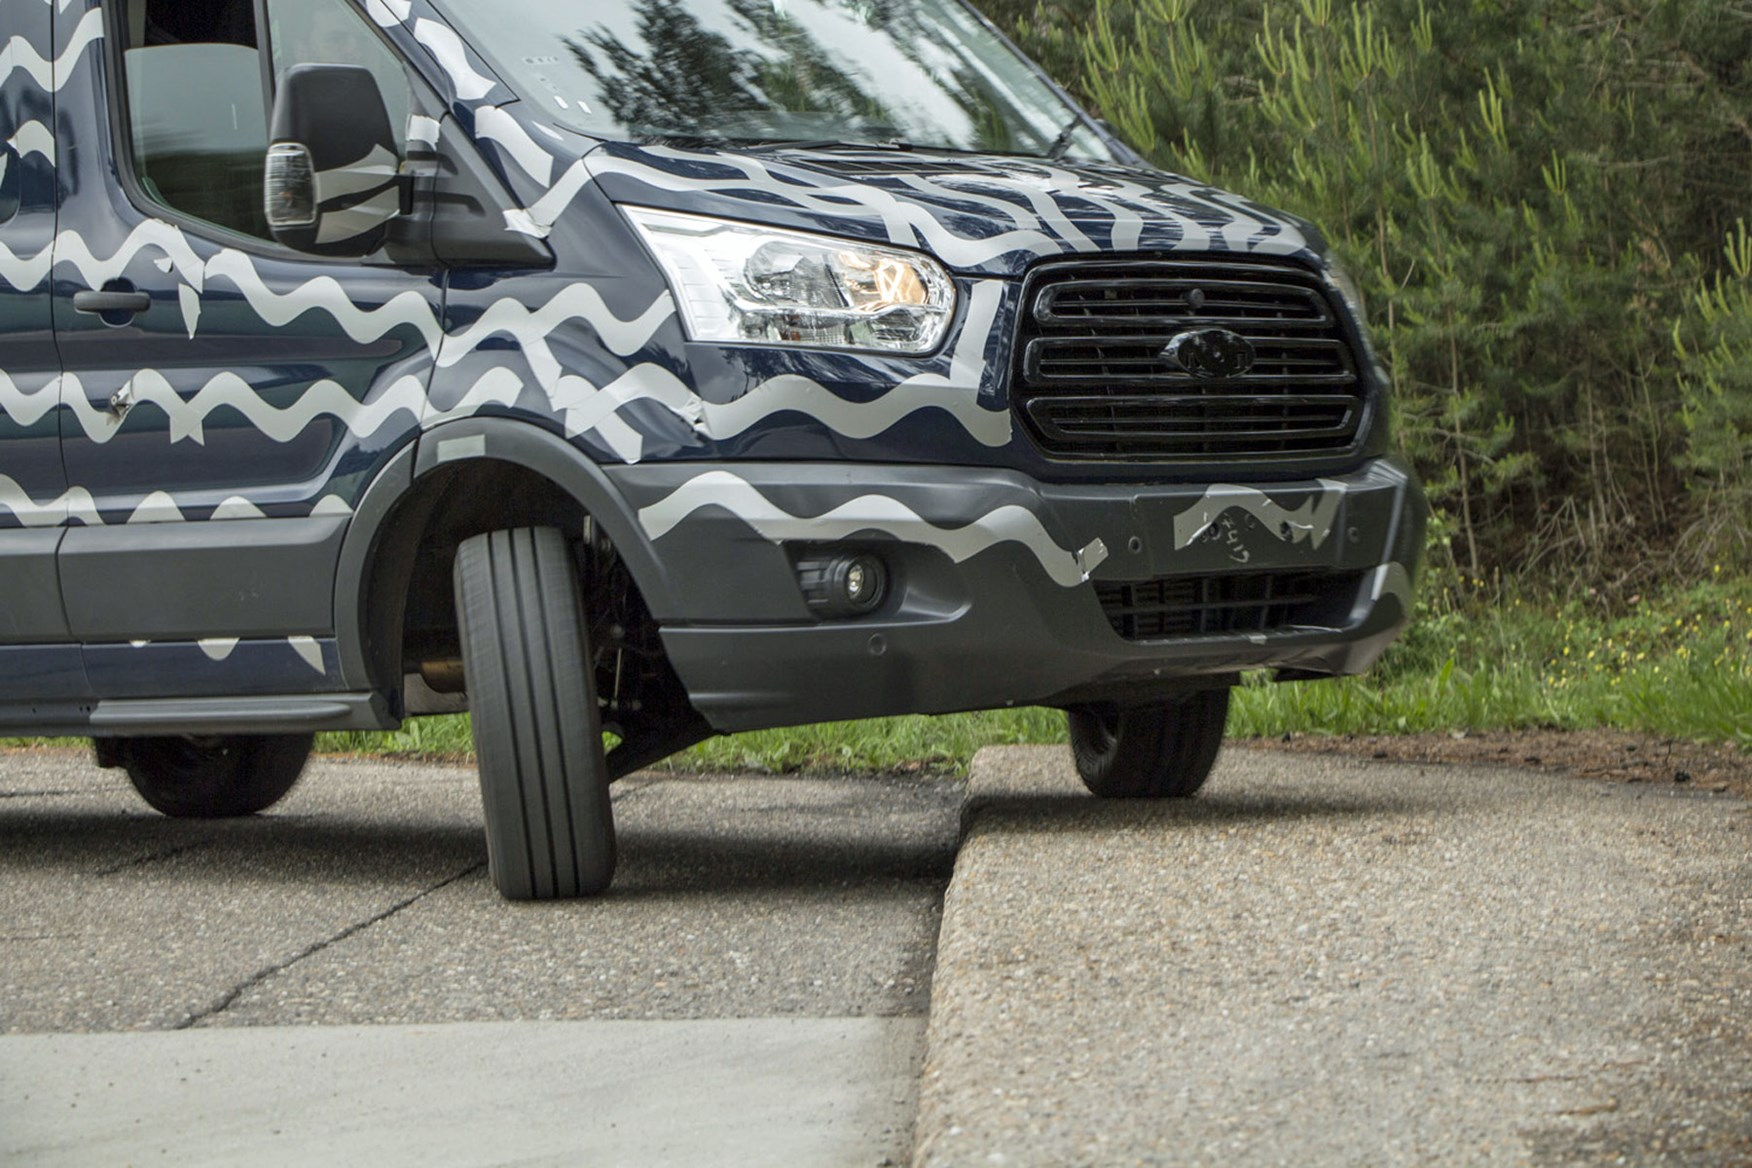 Ford Transit (2014-on) durability testing